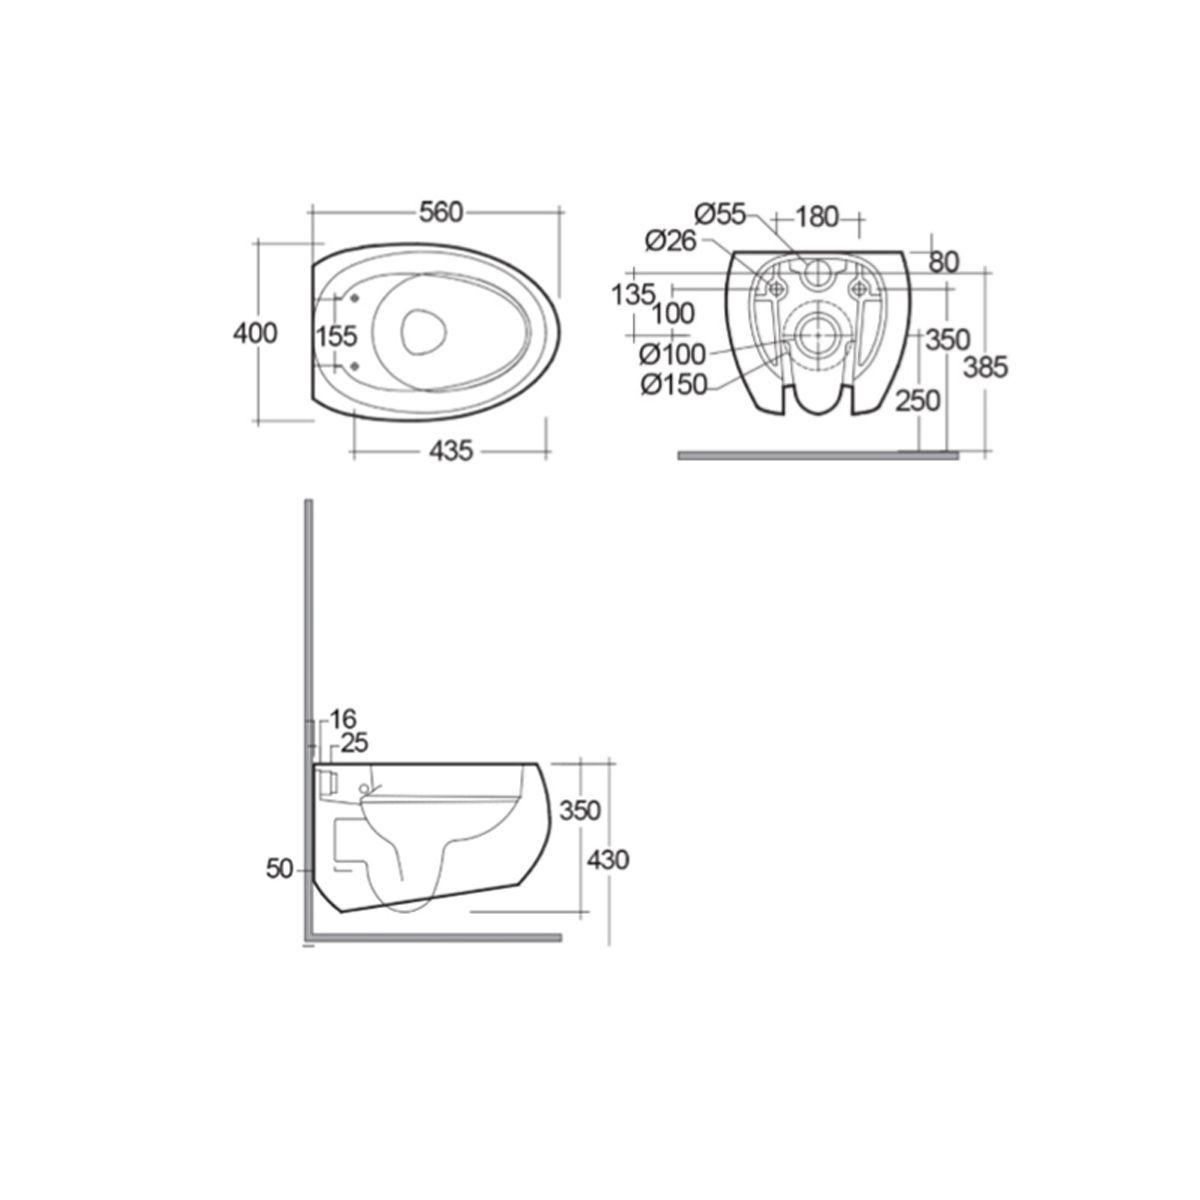 RAK Cloud Matt White Wall Hung Toilet with Soft Close Seat Measurements